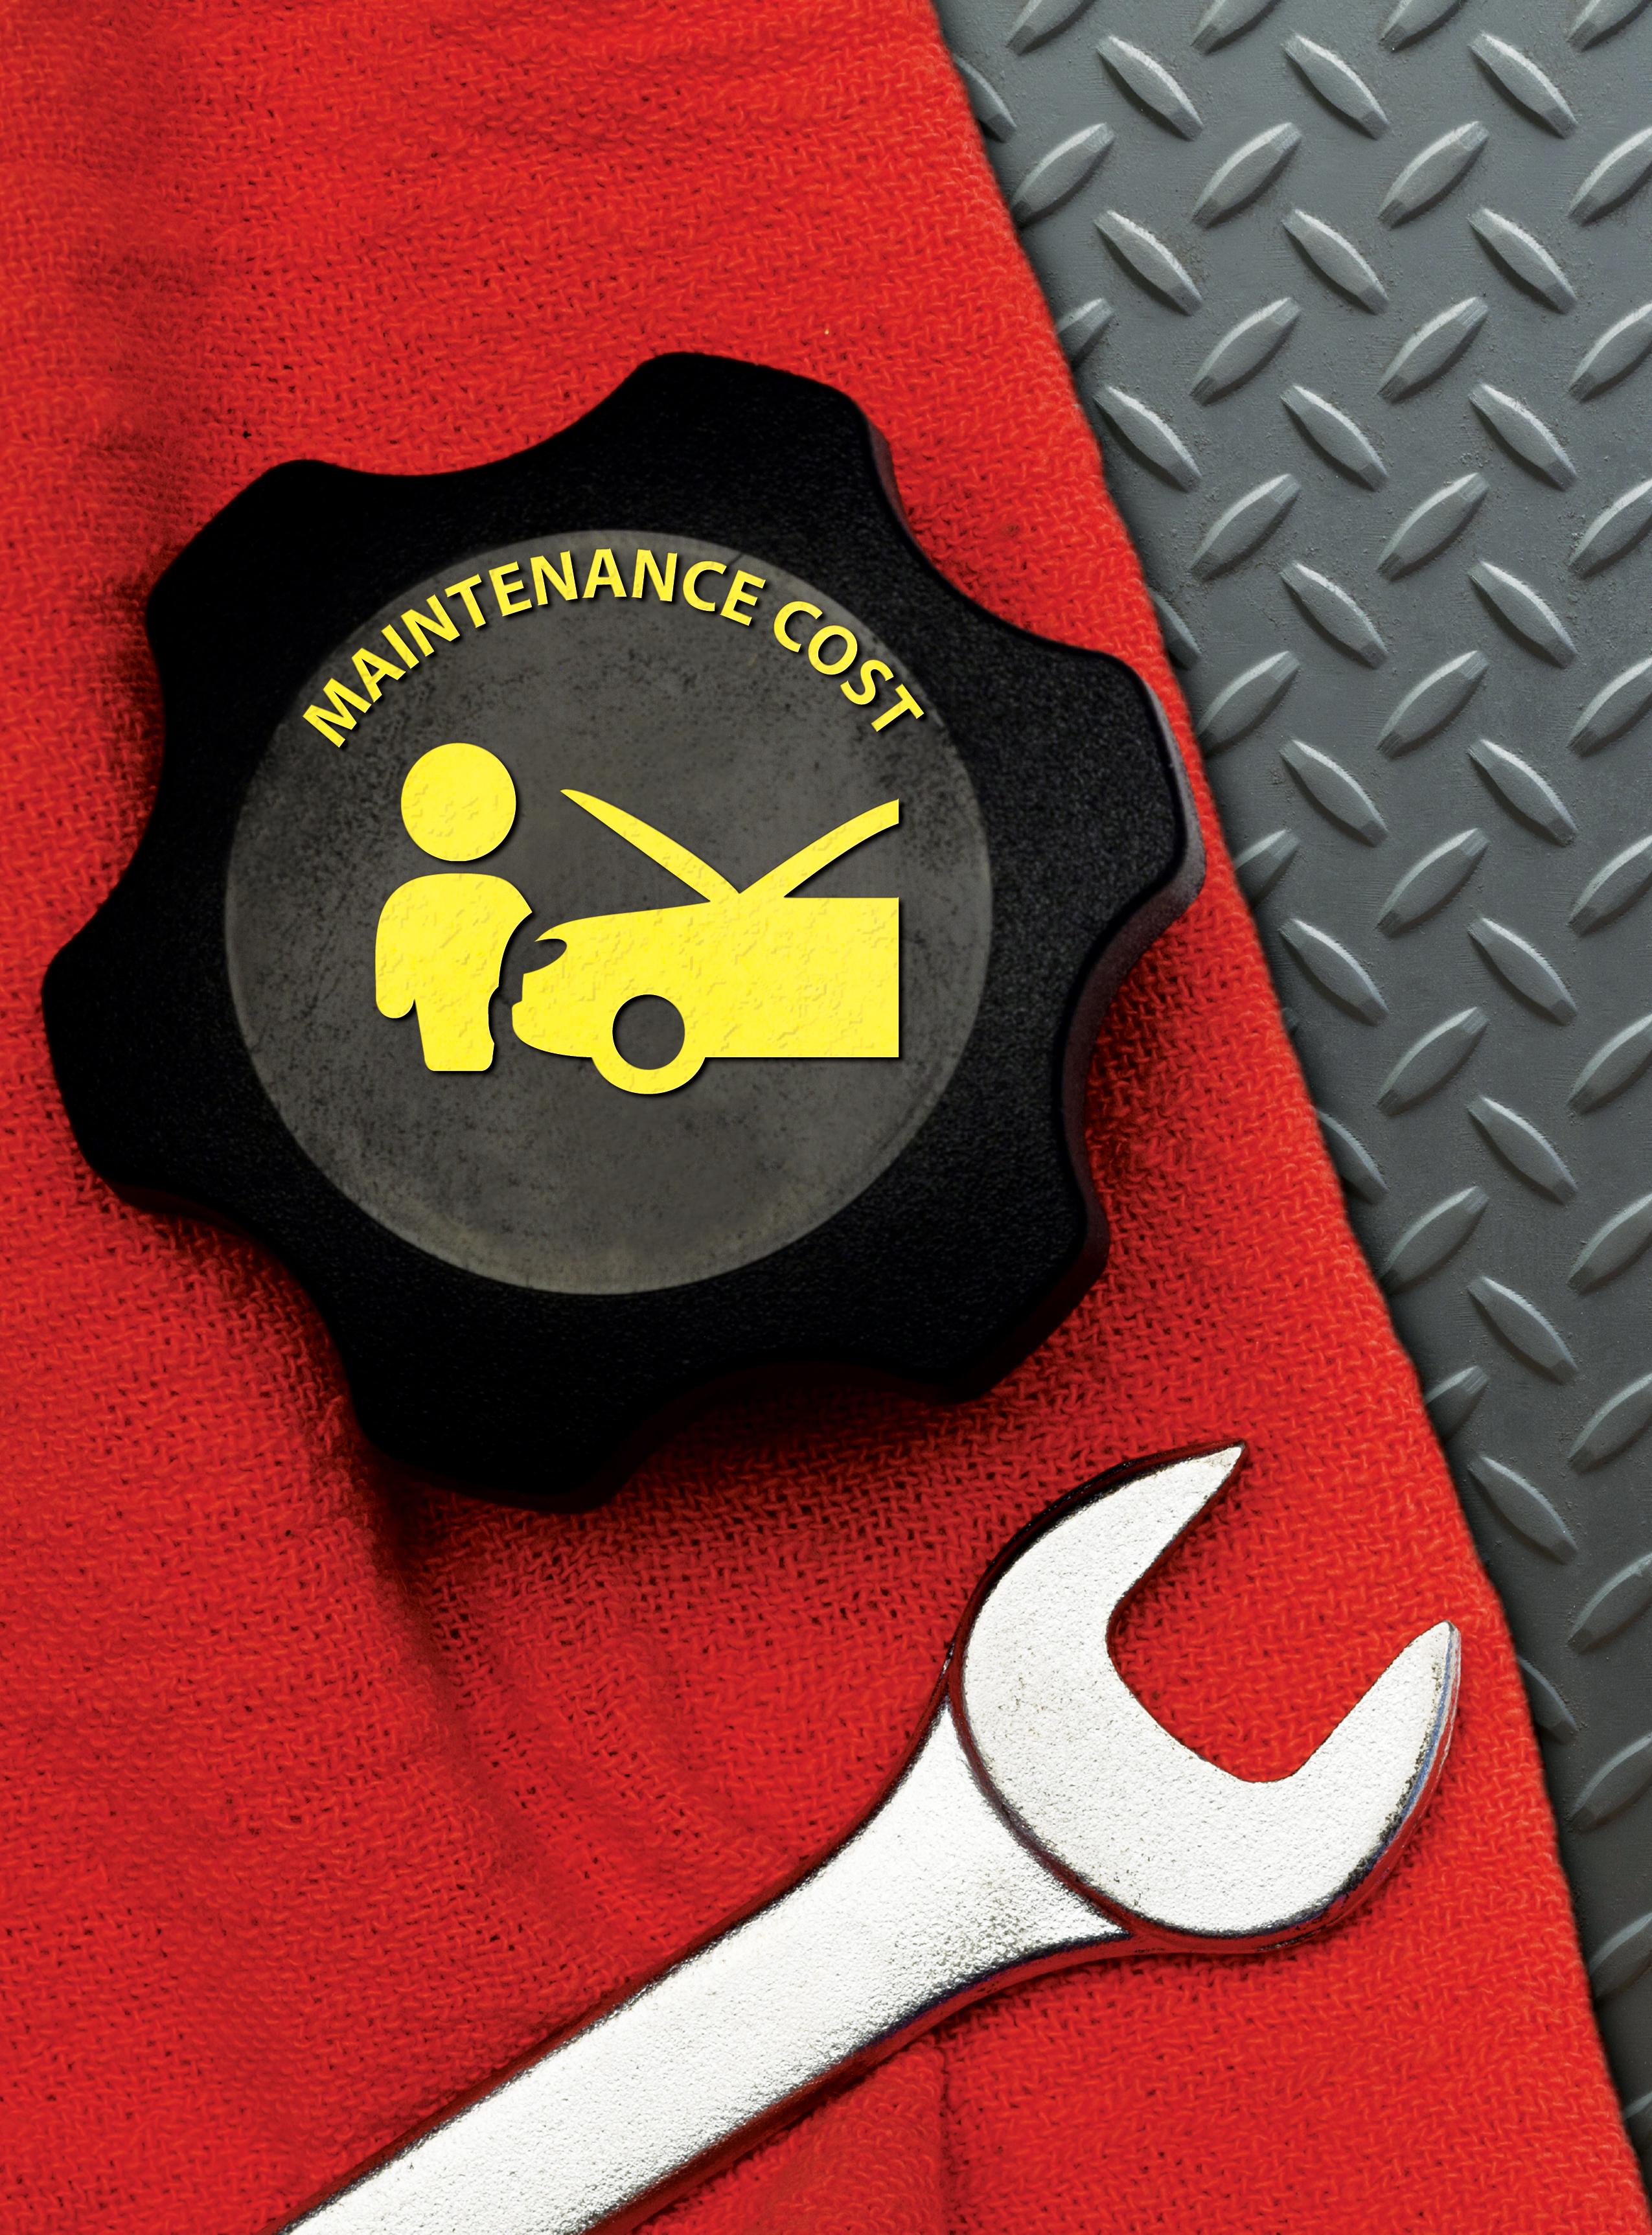 Fleet Car Maintenance Costs Increase Less Than 1%